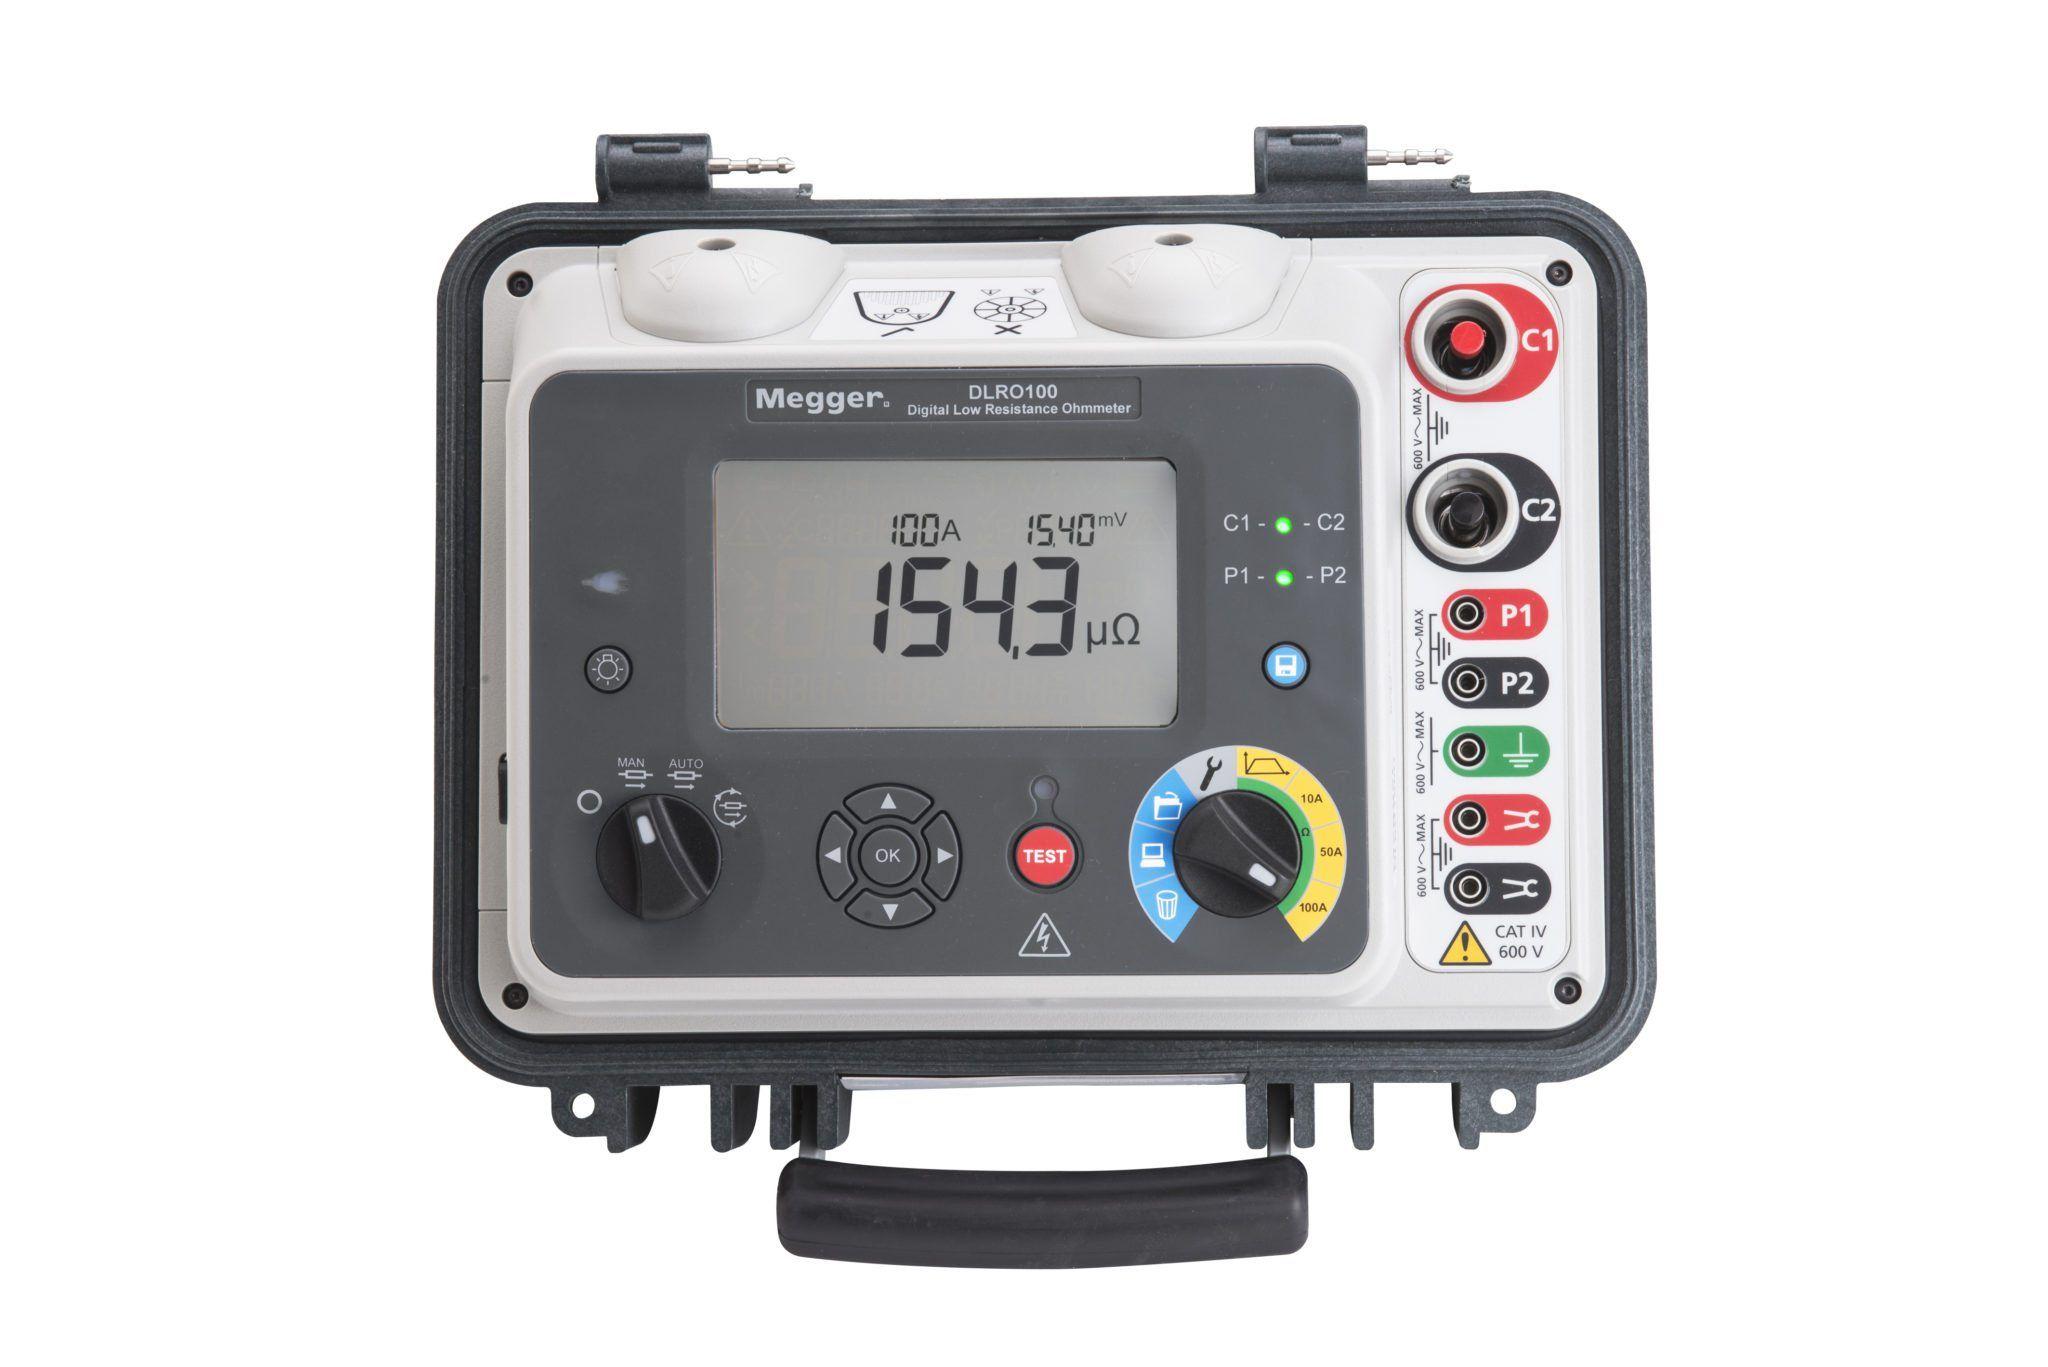 Ohmmeter Good Measurements And A High Low : Megger dlro digital low resistance ohmmeters u sales rent